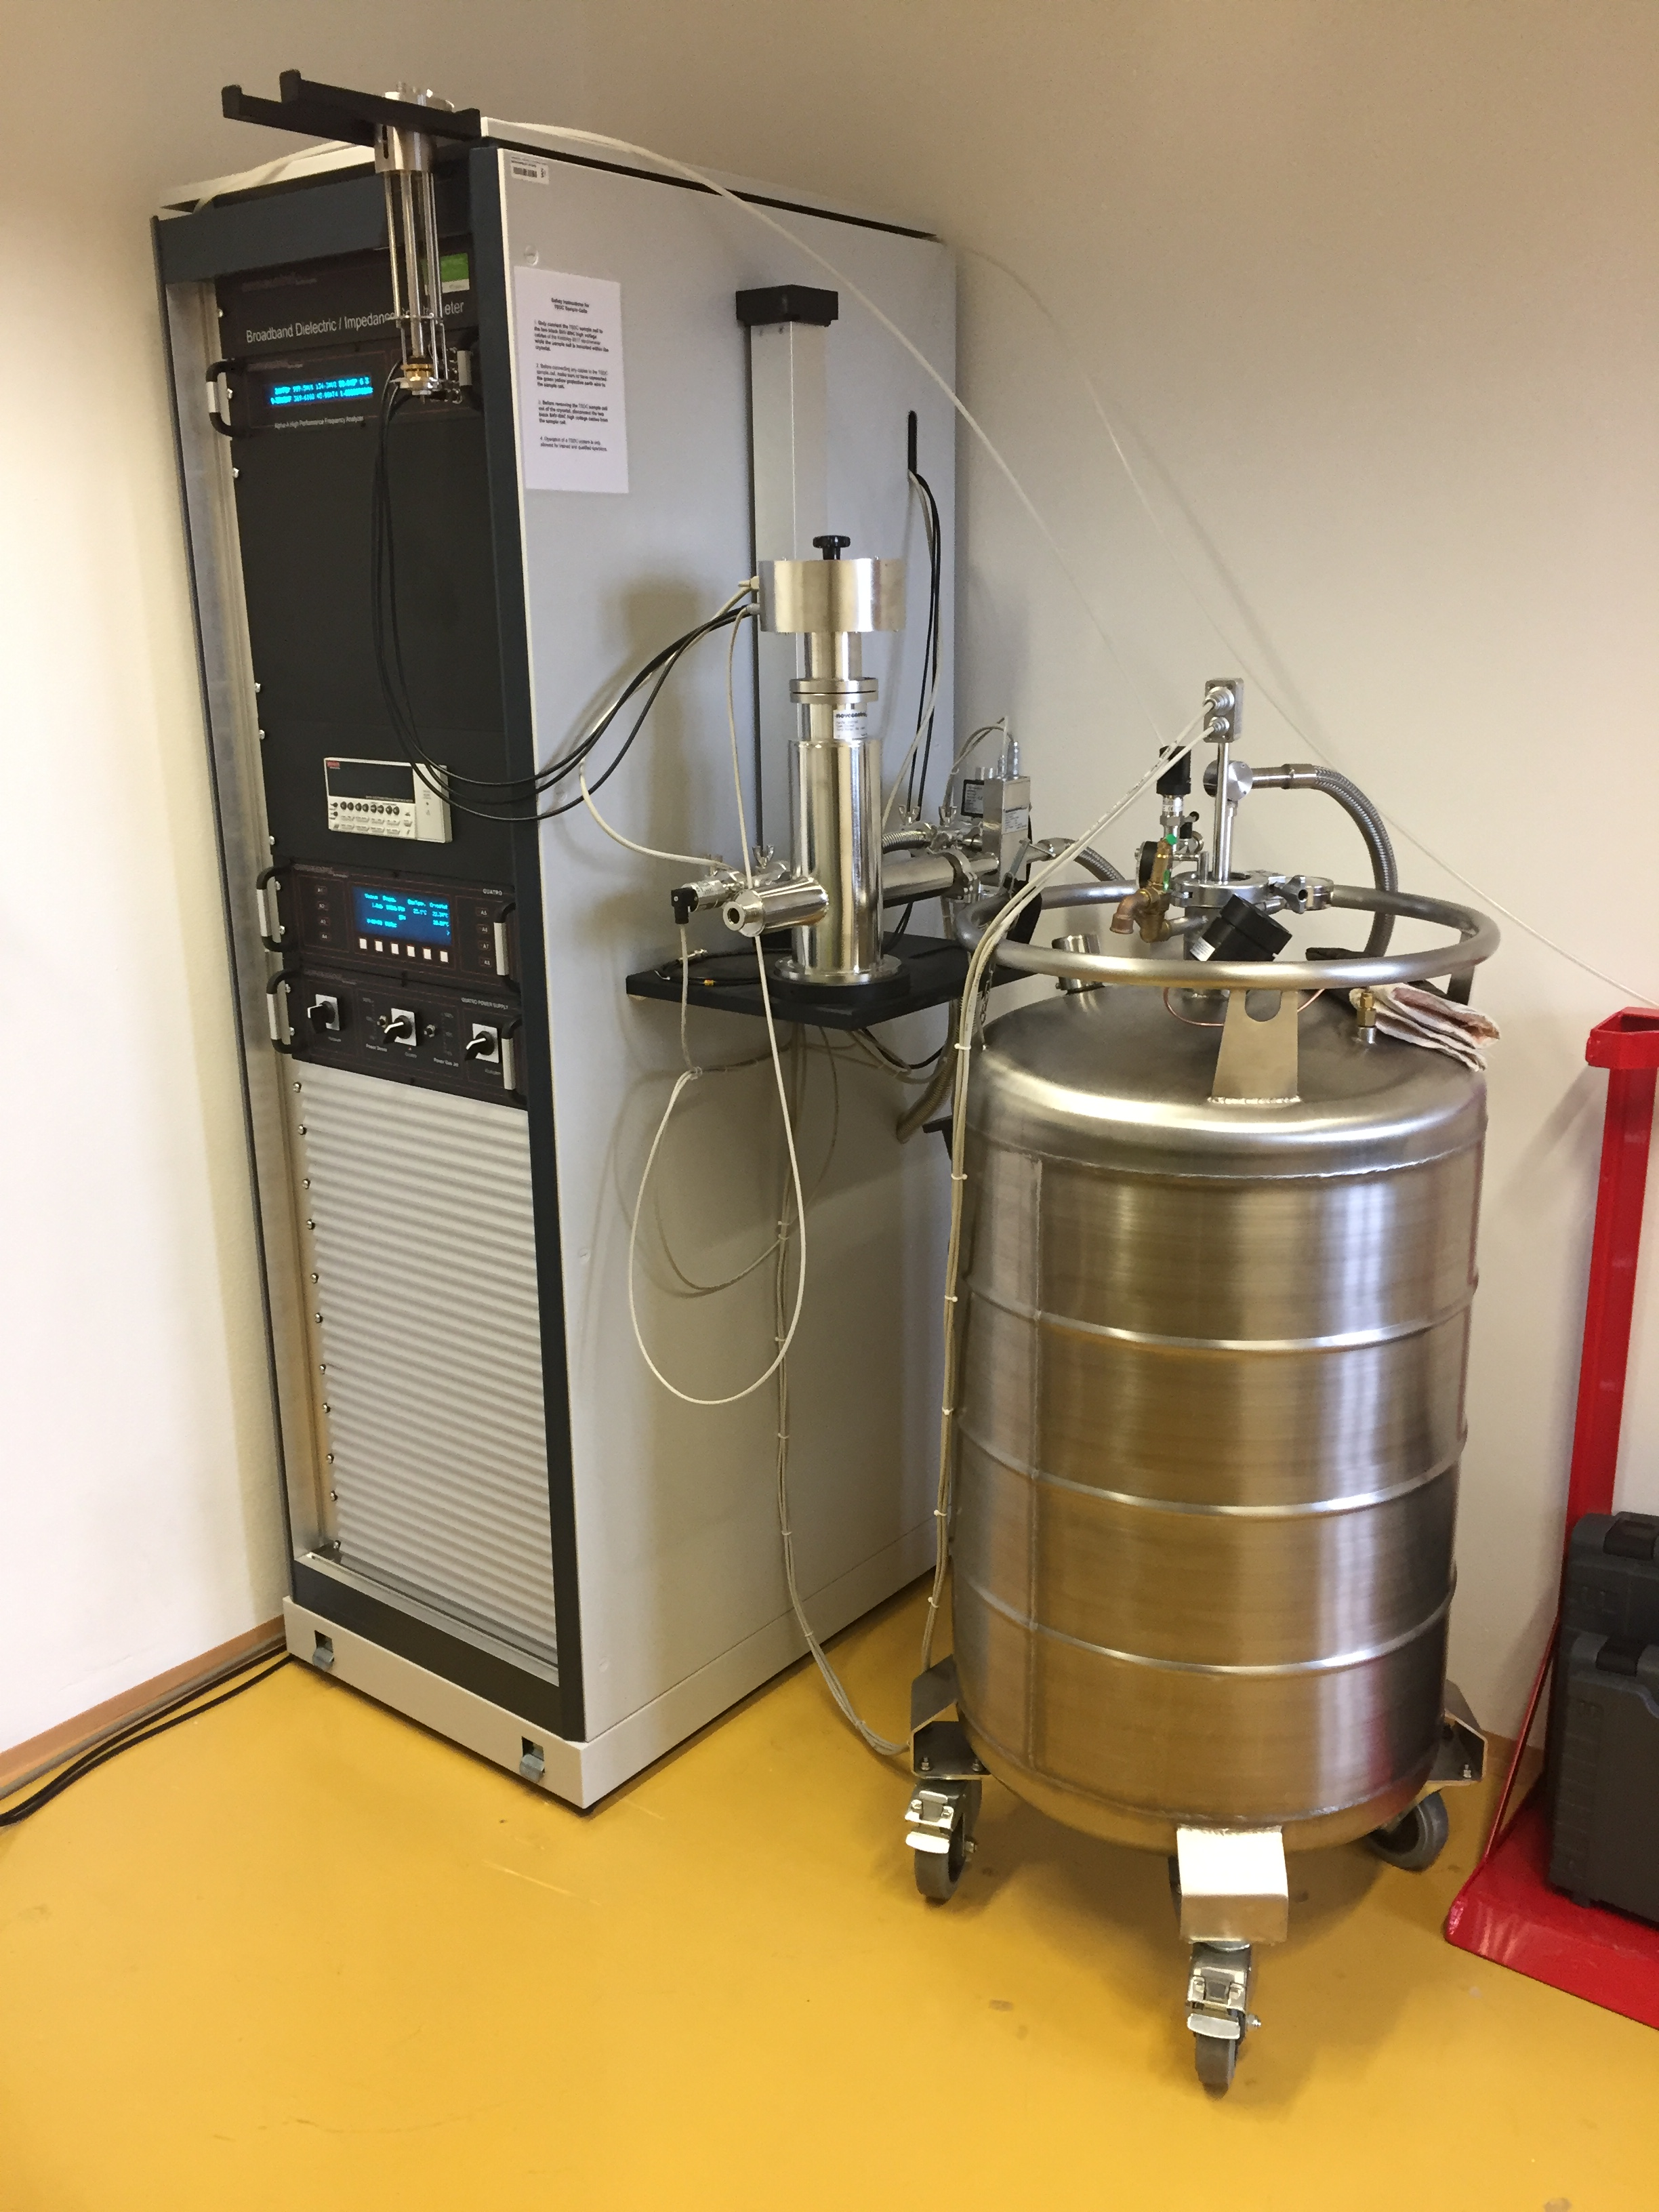 Materiály pro elektrotechniku - vodiče a dielektrika - Impedanční analyzátor s kryostatem